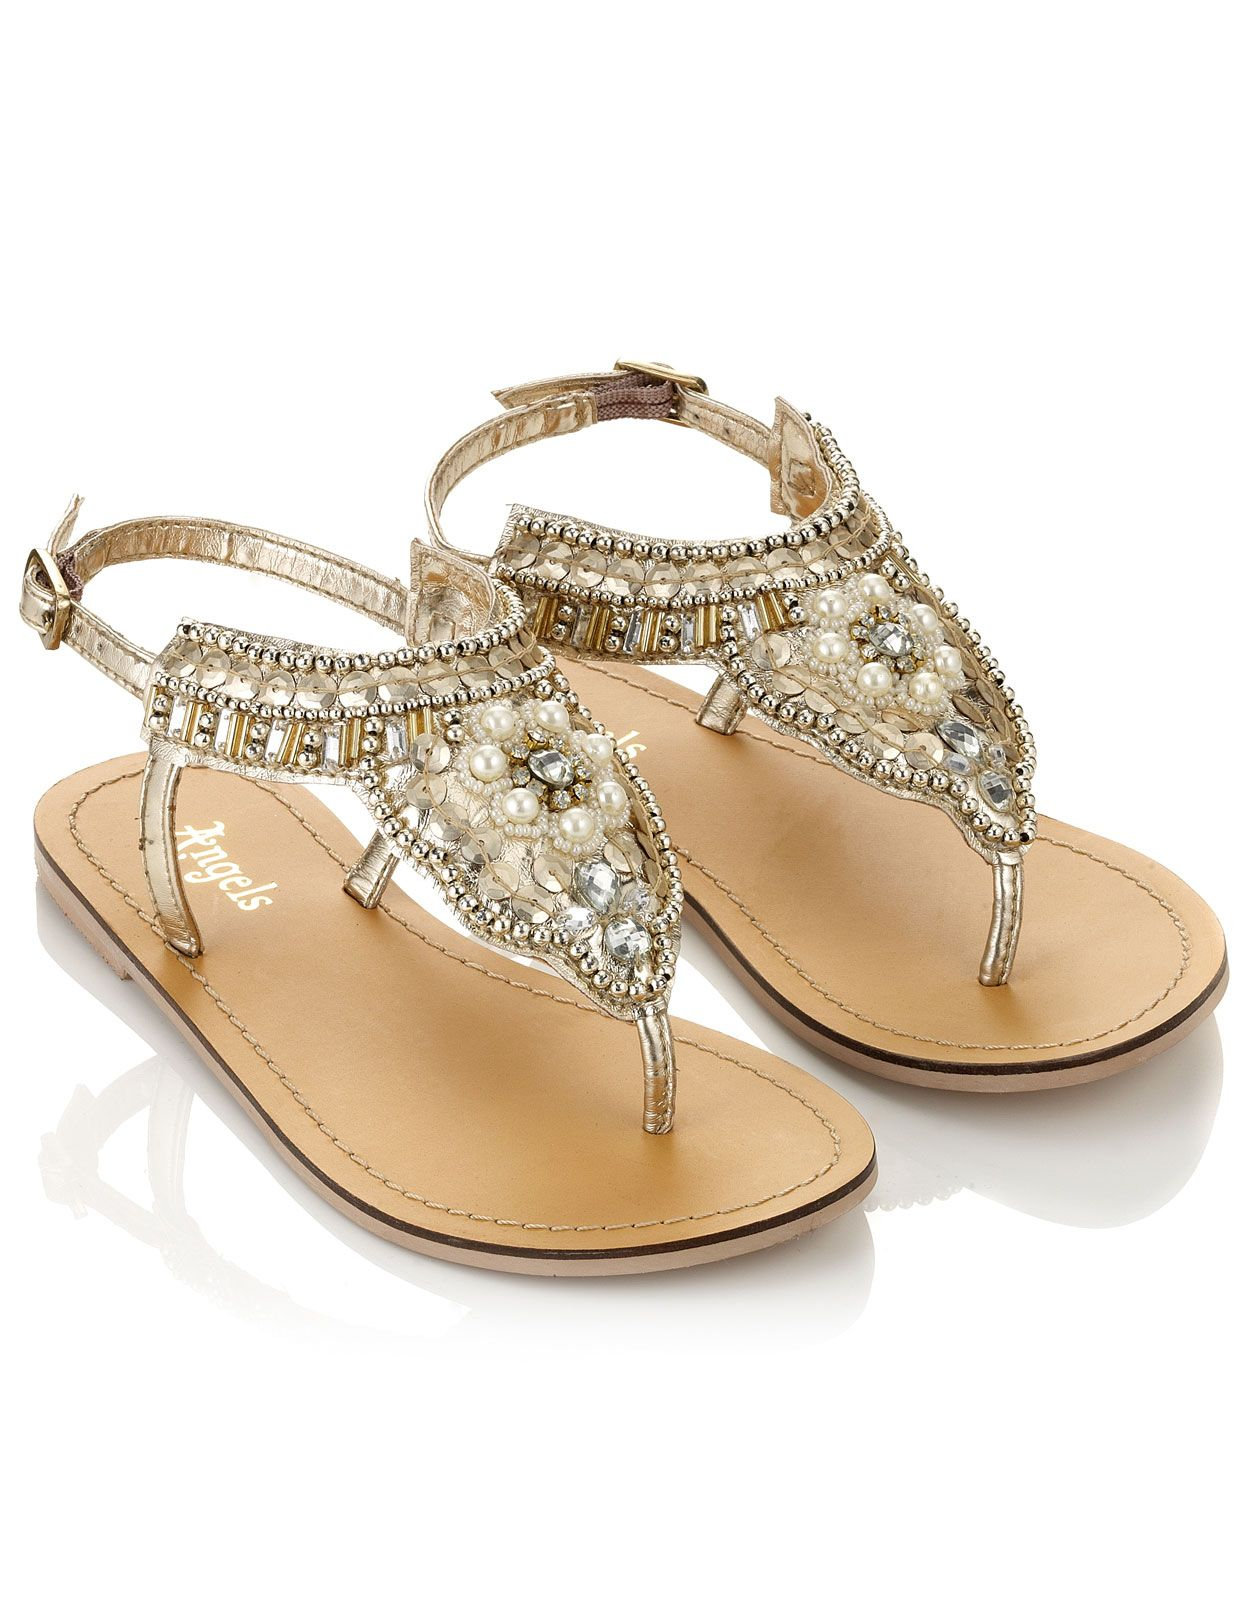 Monsoon Girls Gold Shoes